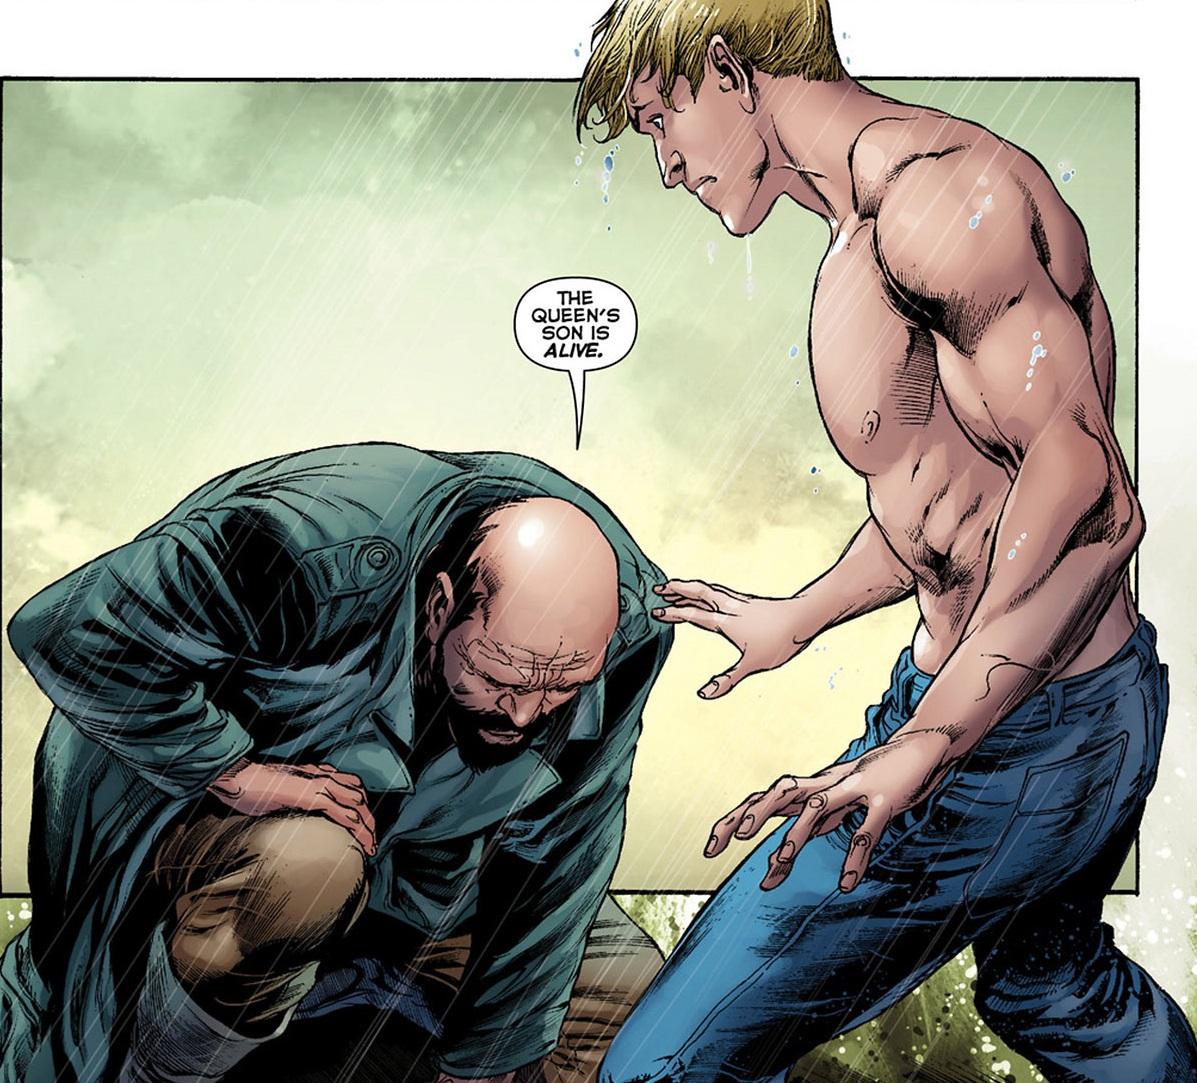 Vulko is the Hulk Hogan of Atlantis.